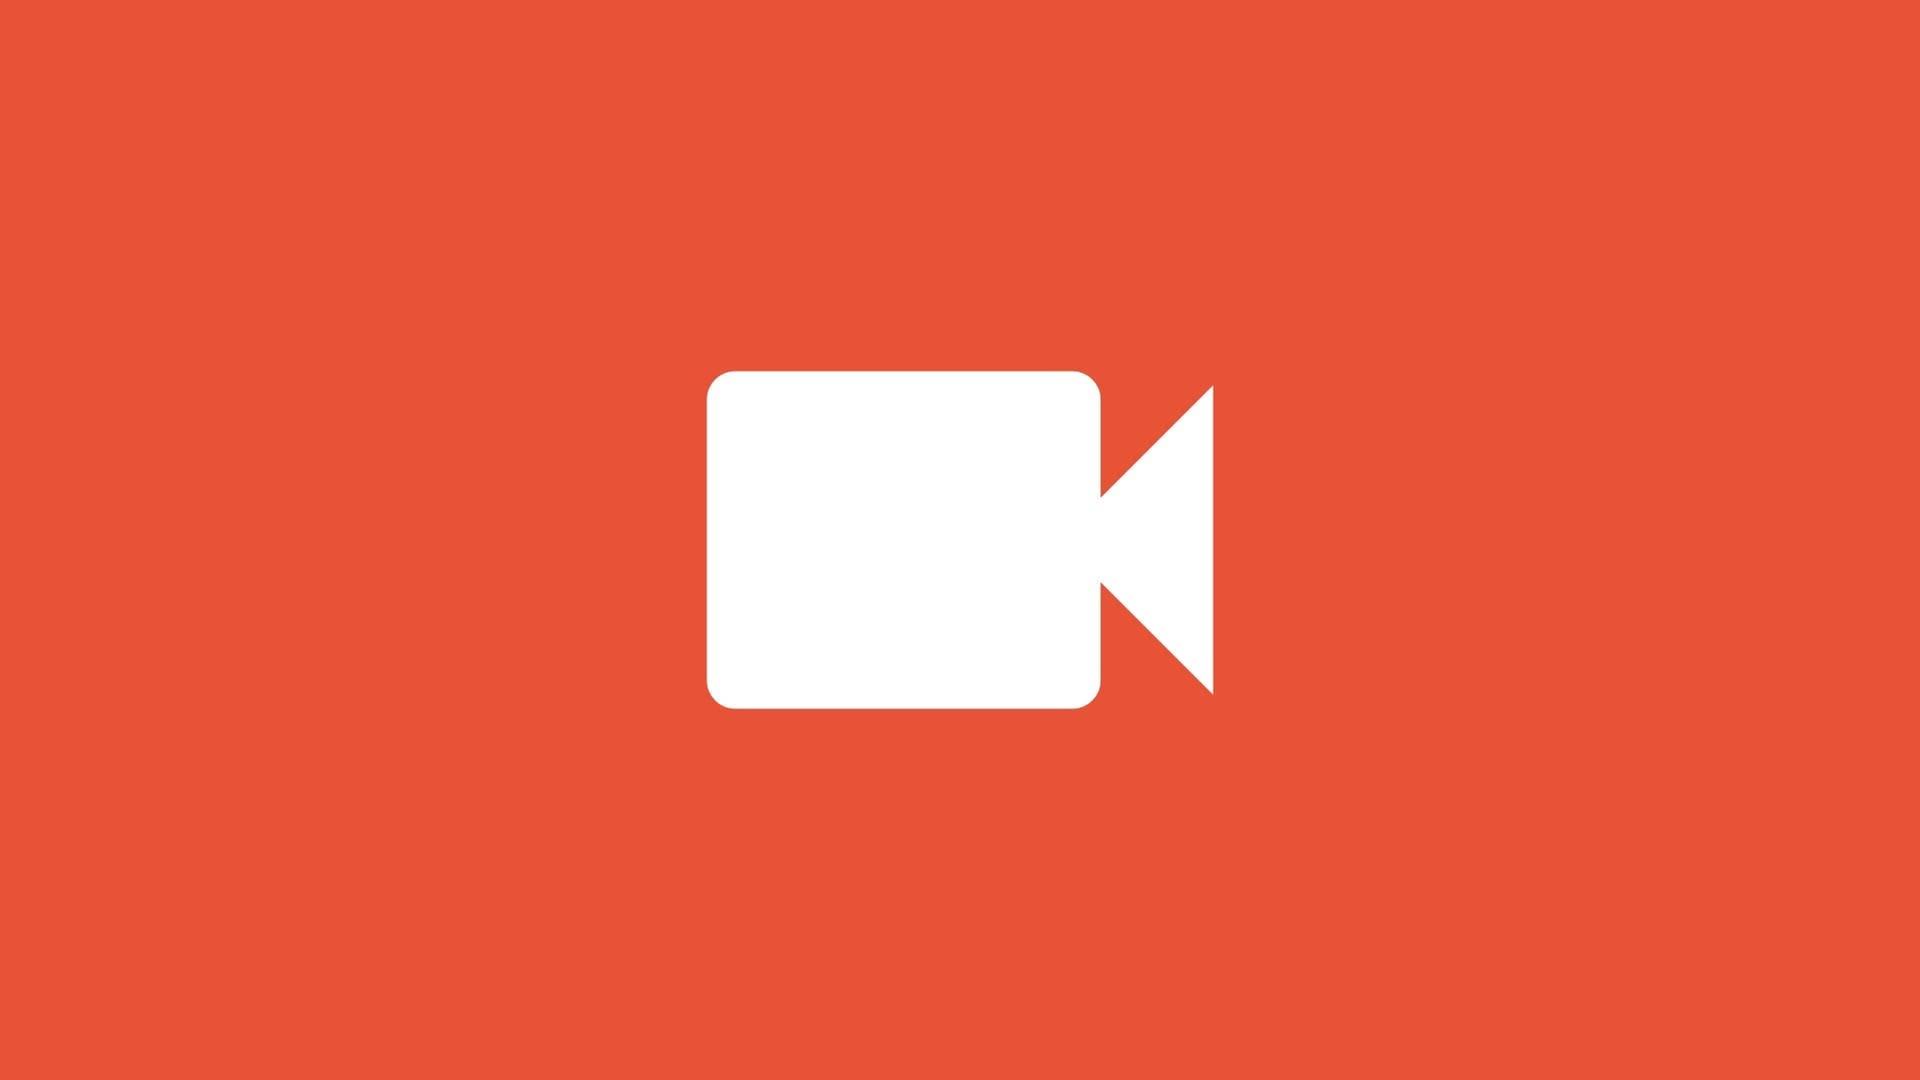 Swr 2 Livestream